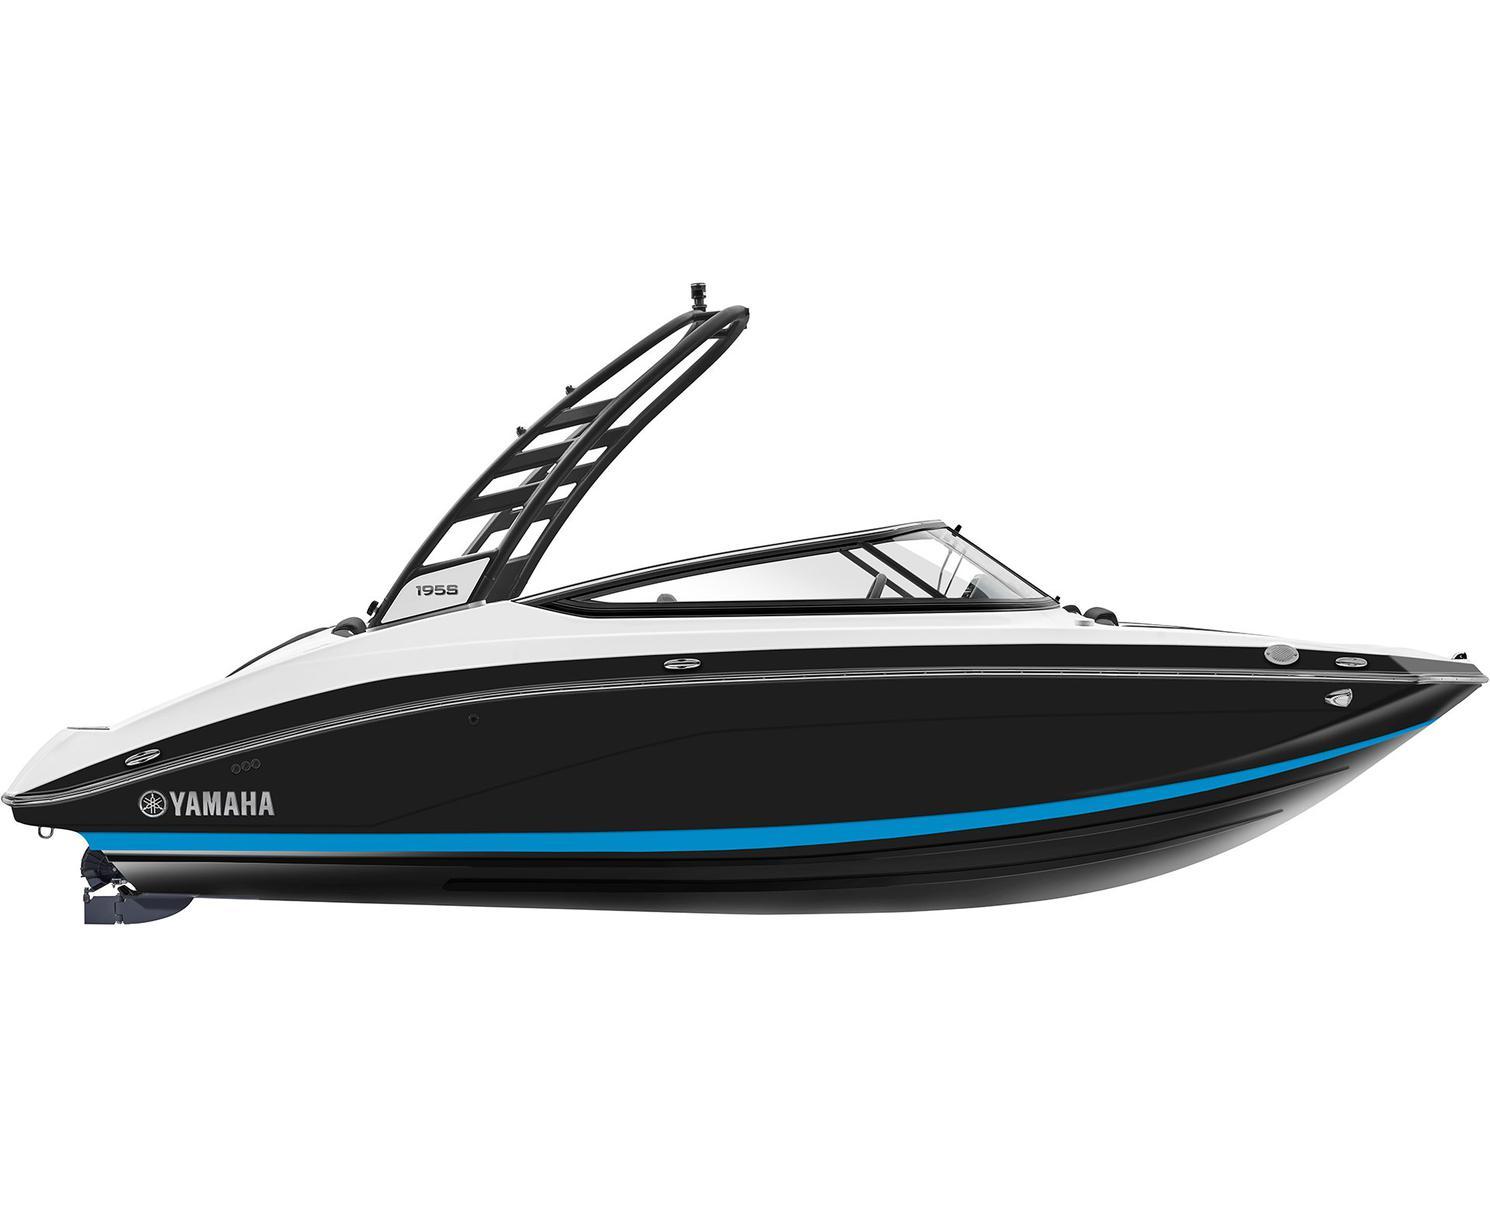 2022 Yamaha 195S Black